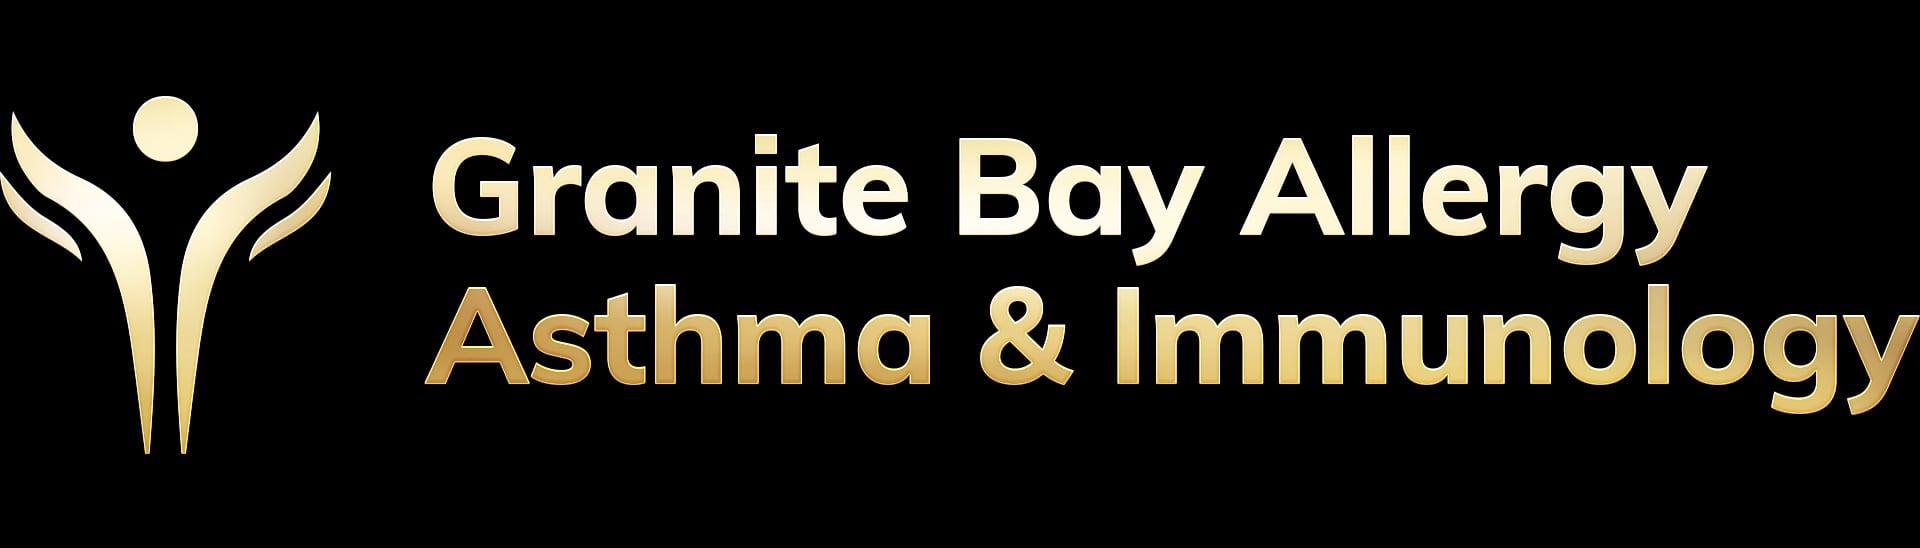 Granite Bay Allergy, Asthma & Immunology